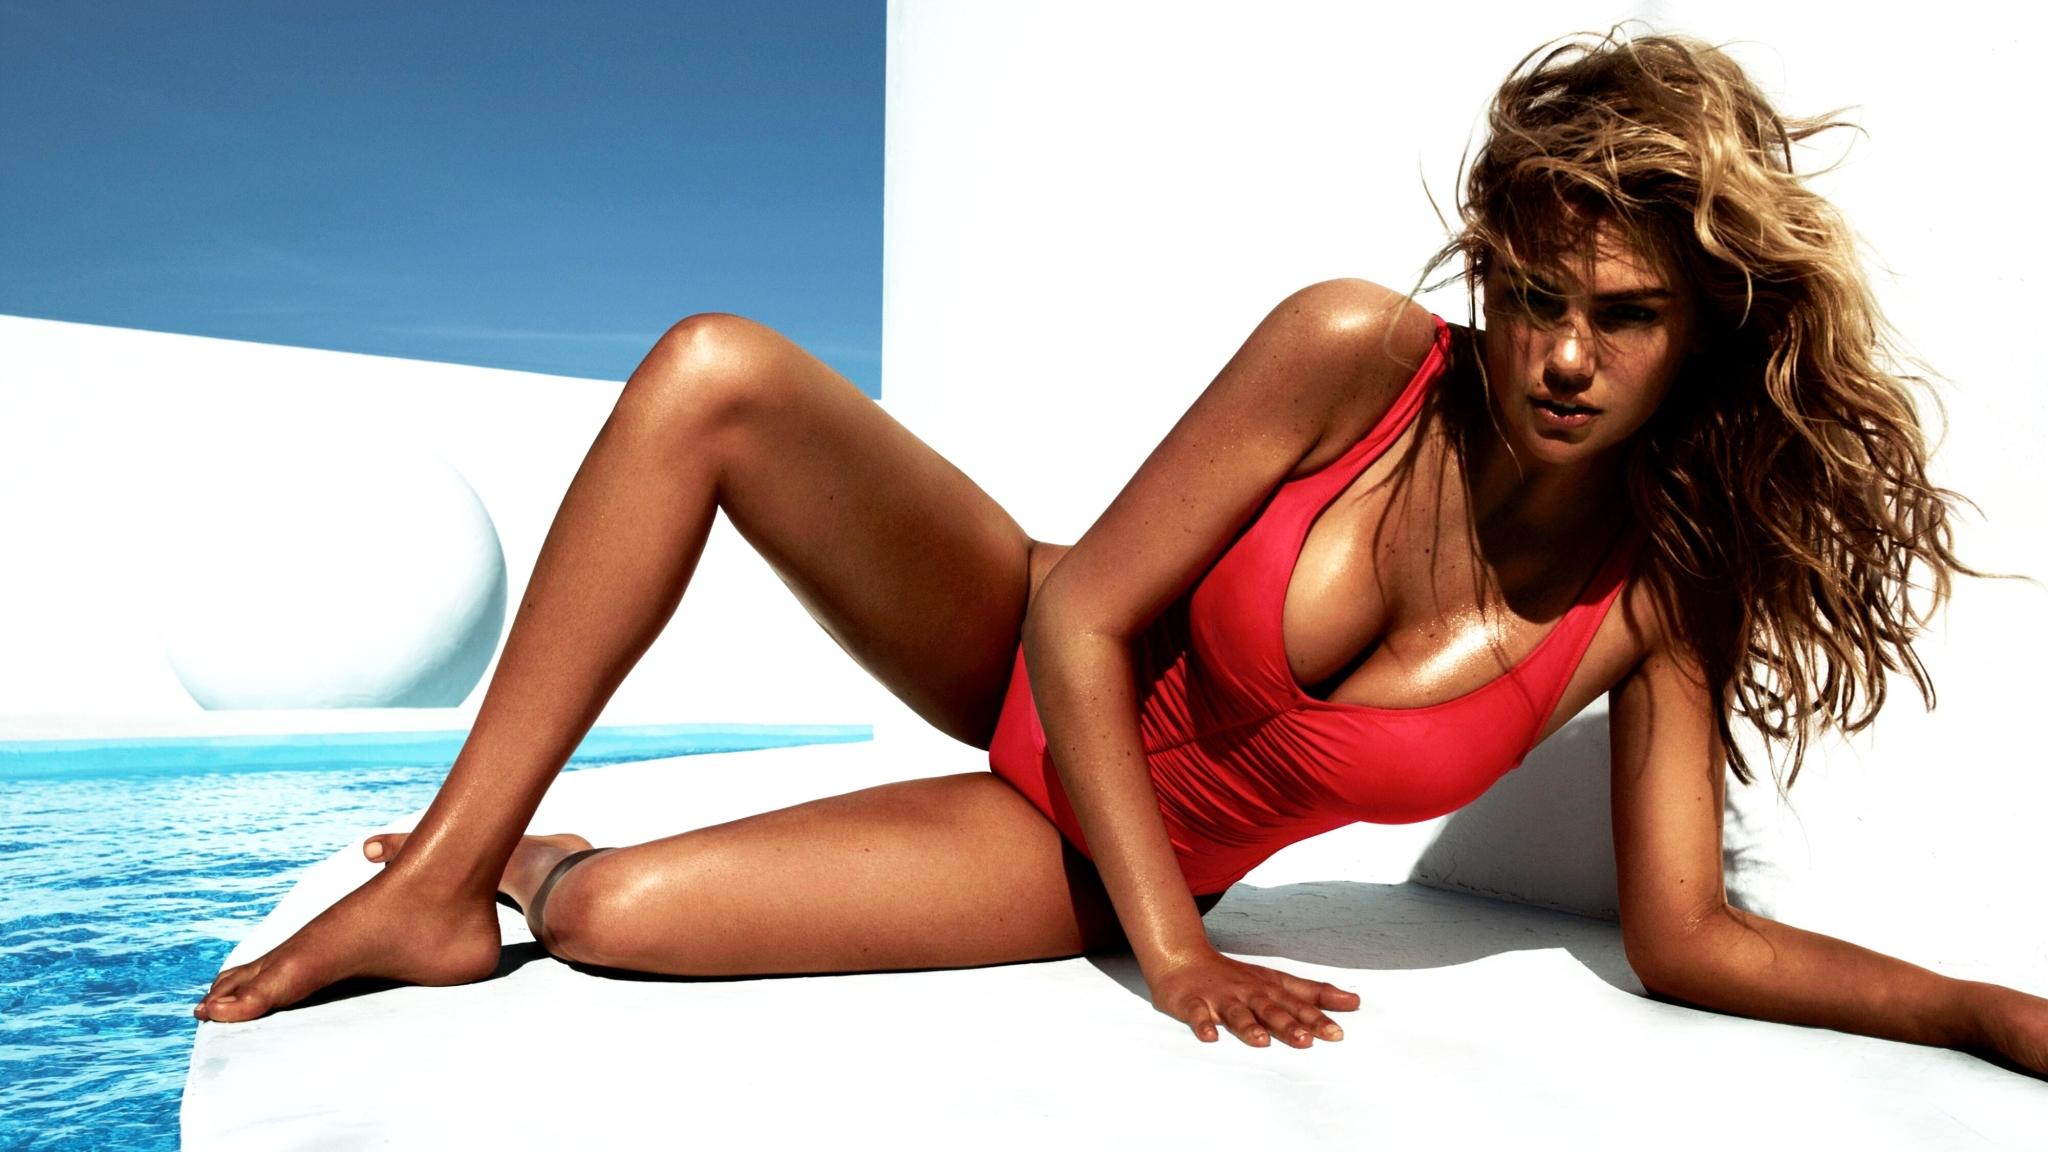 Kate upton bikini hd 4k wallpaper - Hd bikini wallpapers for pc ...